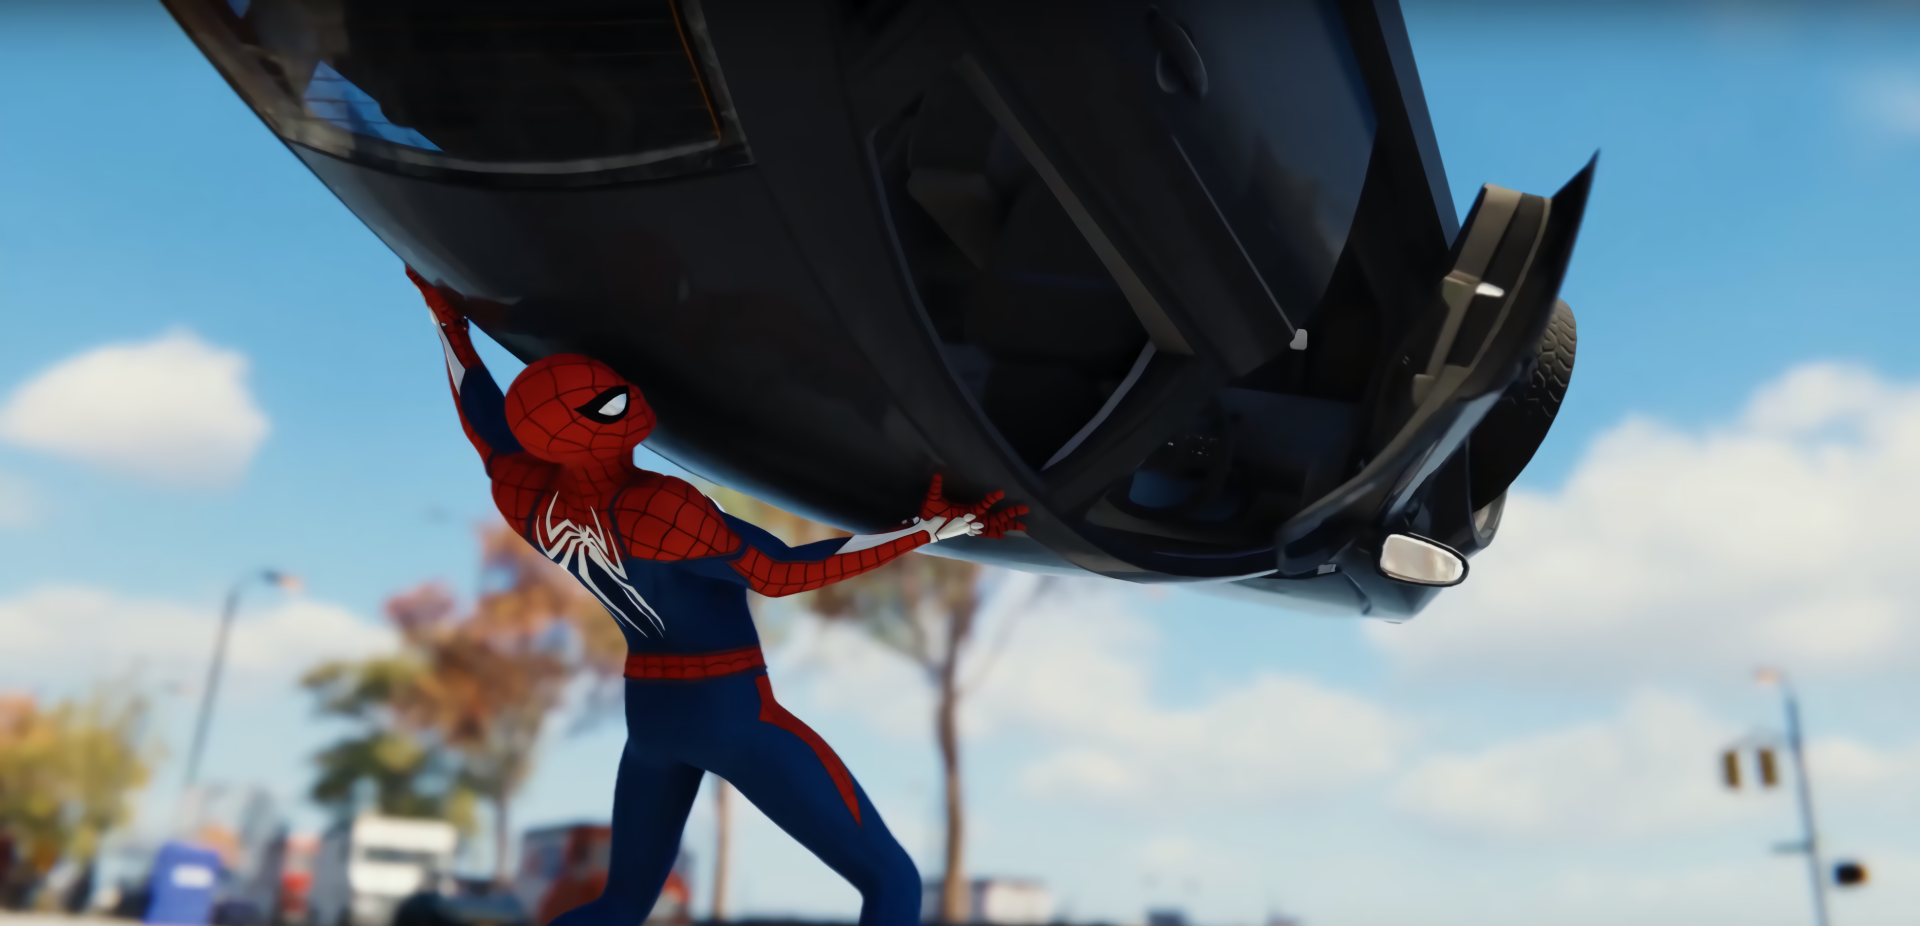 Spider-Man Ps4 Wallpaper Fond d'écran HD   Arrière-Plan   3788x1826   ID:939170 - Wallpaper Abyss